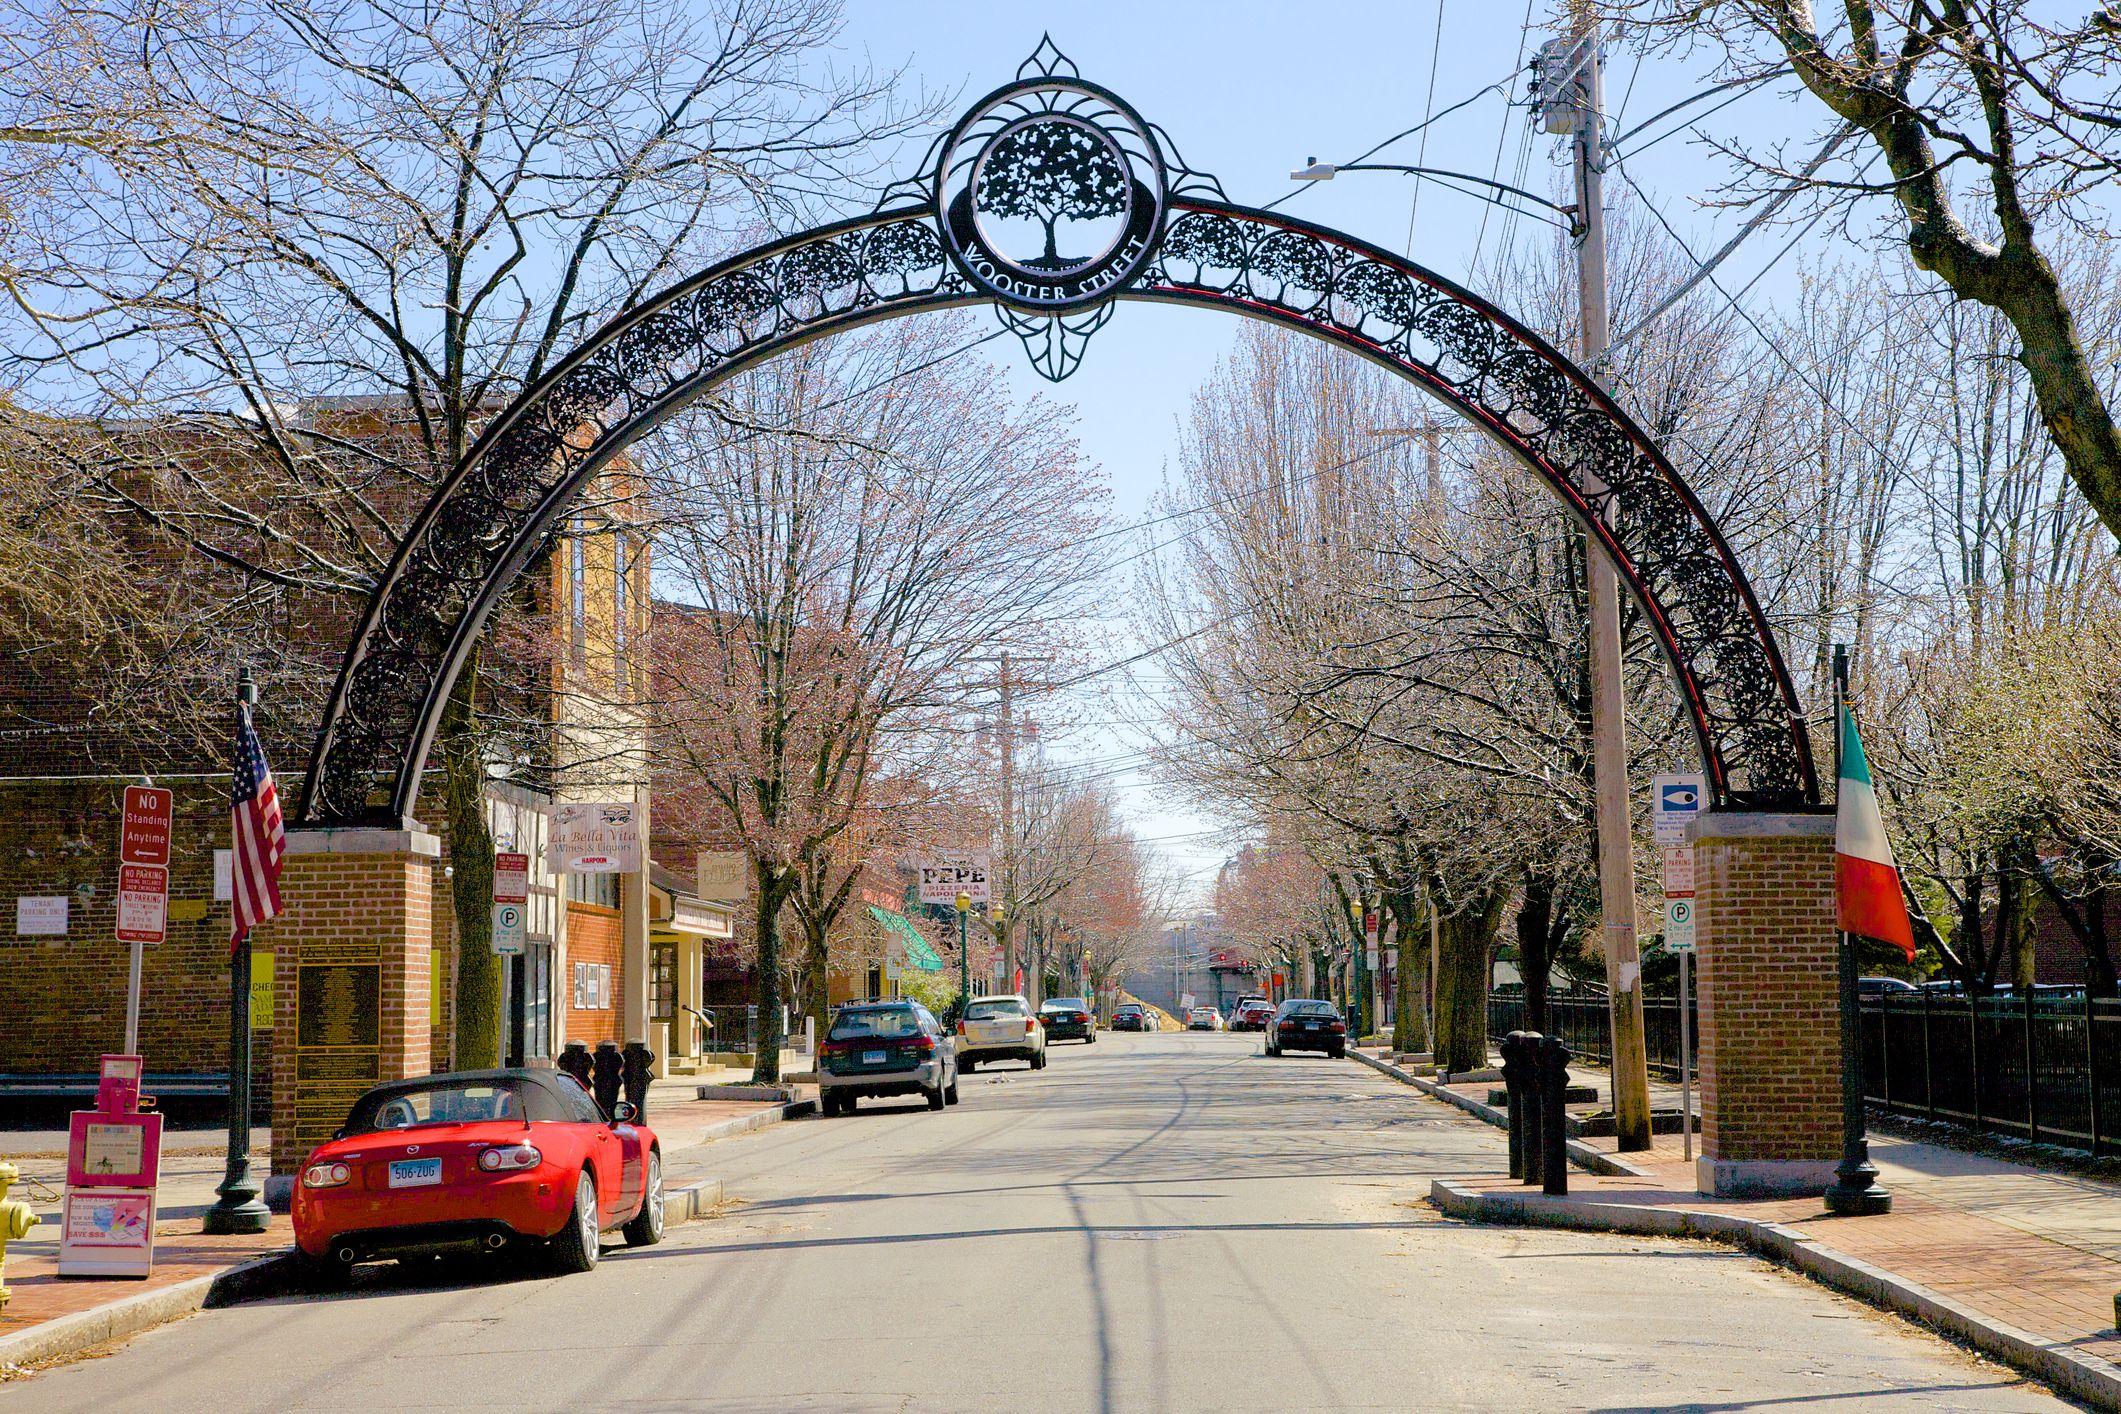 Metal arch in New Haven's Little Italy neighborhood